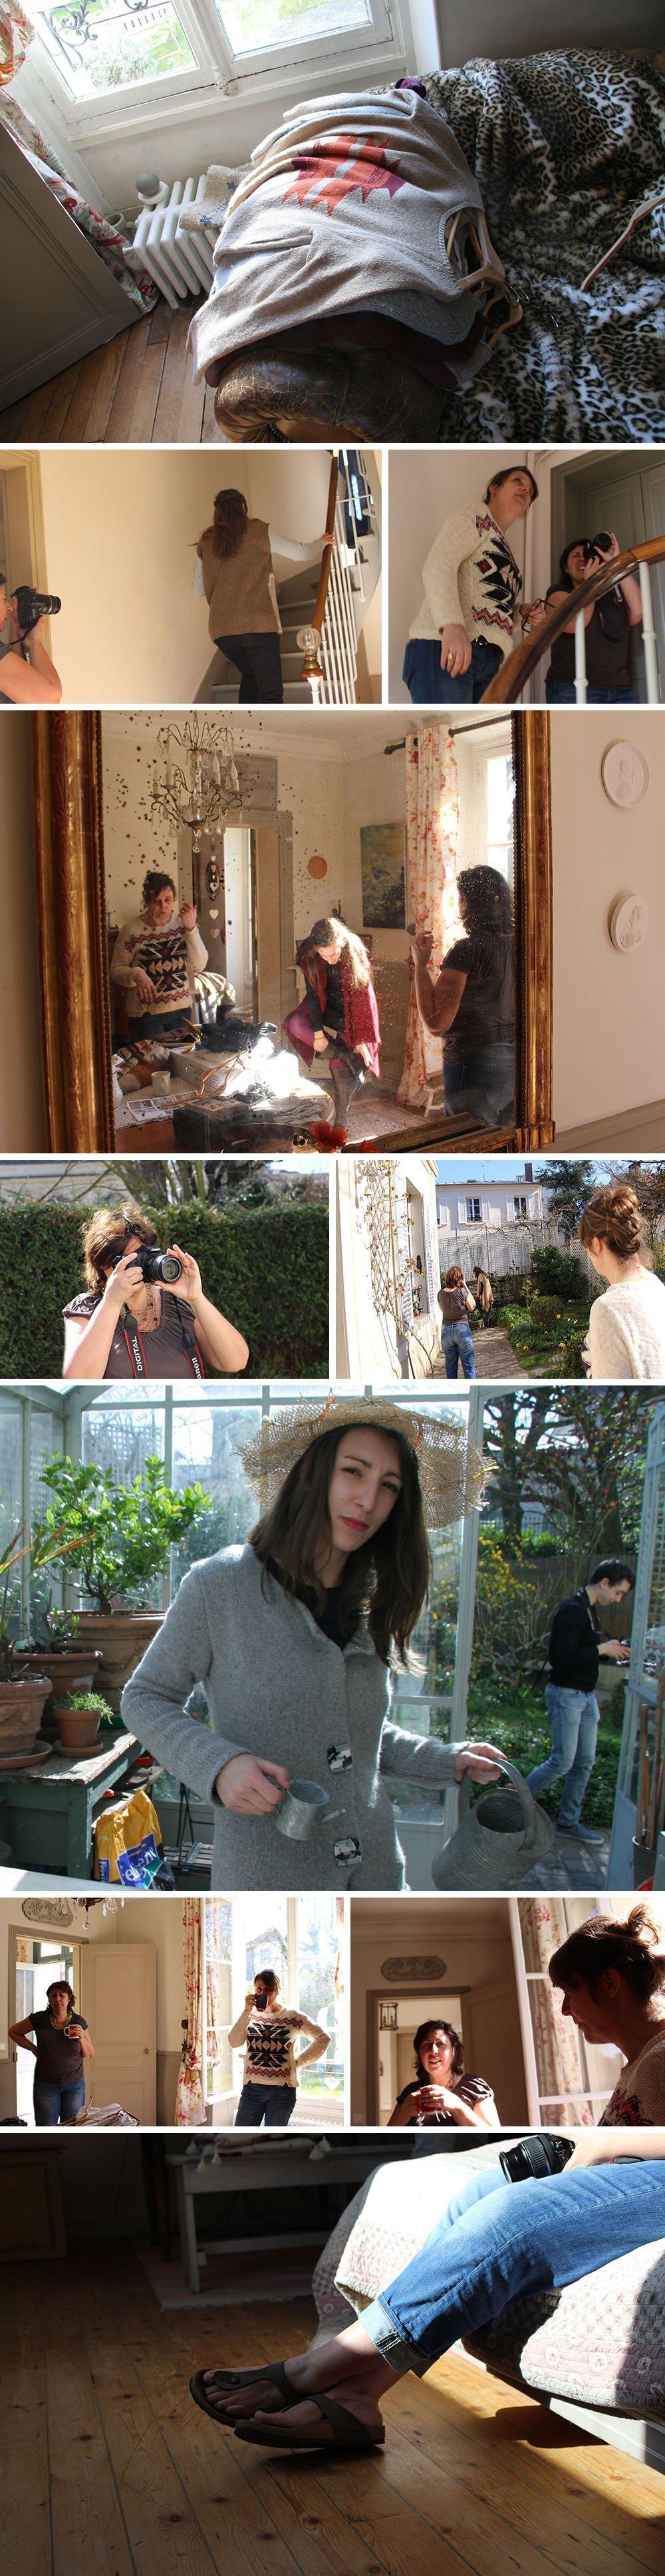 tournage montagel